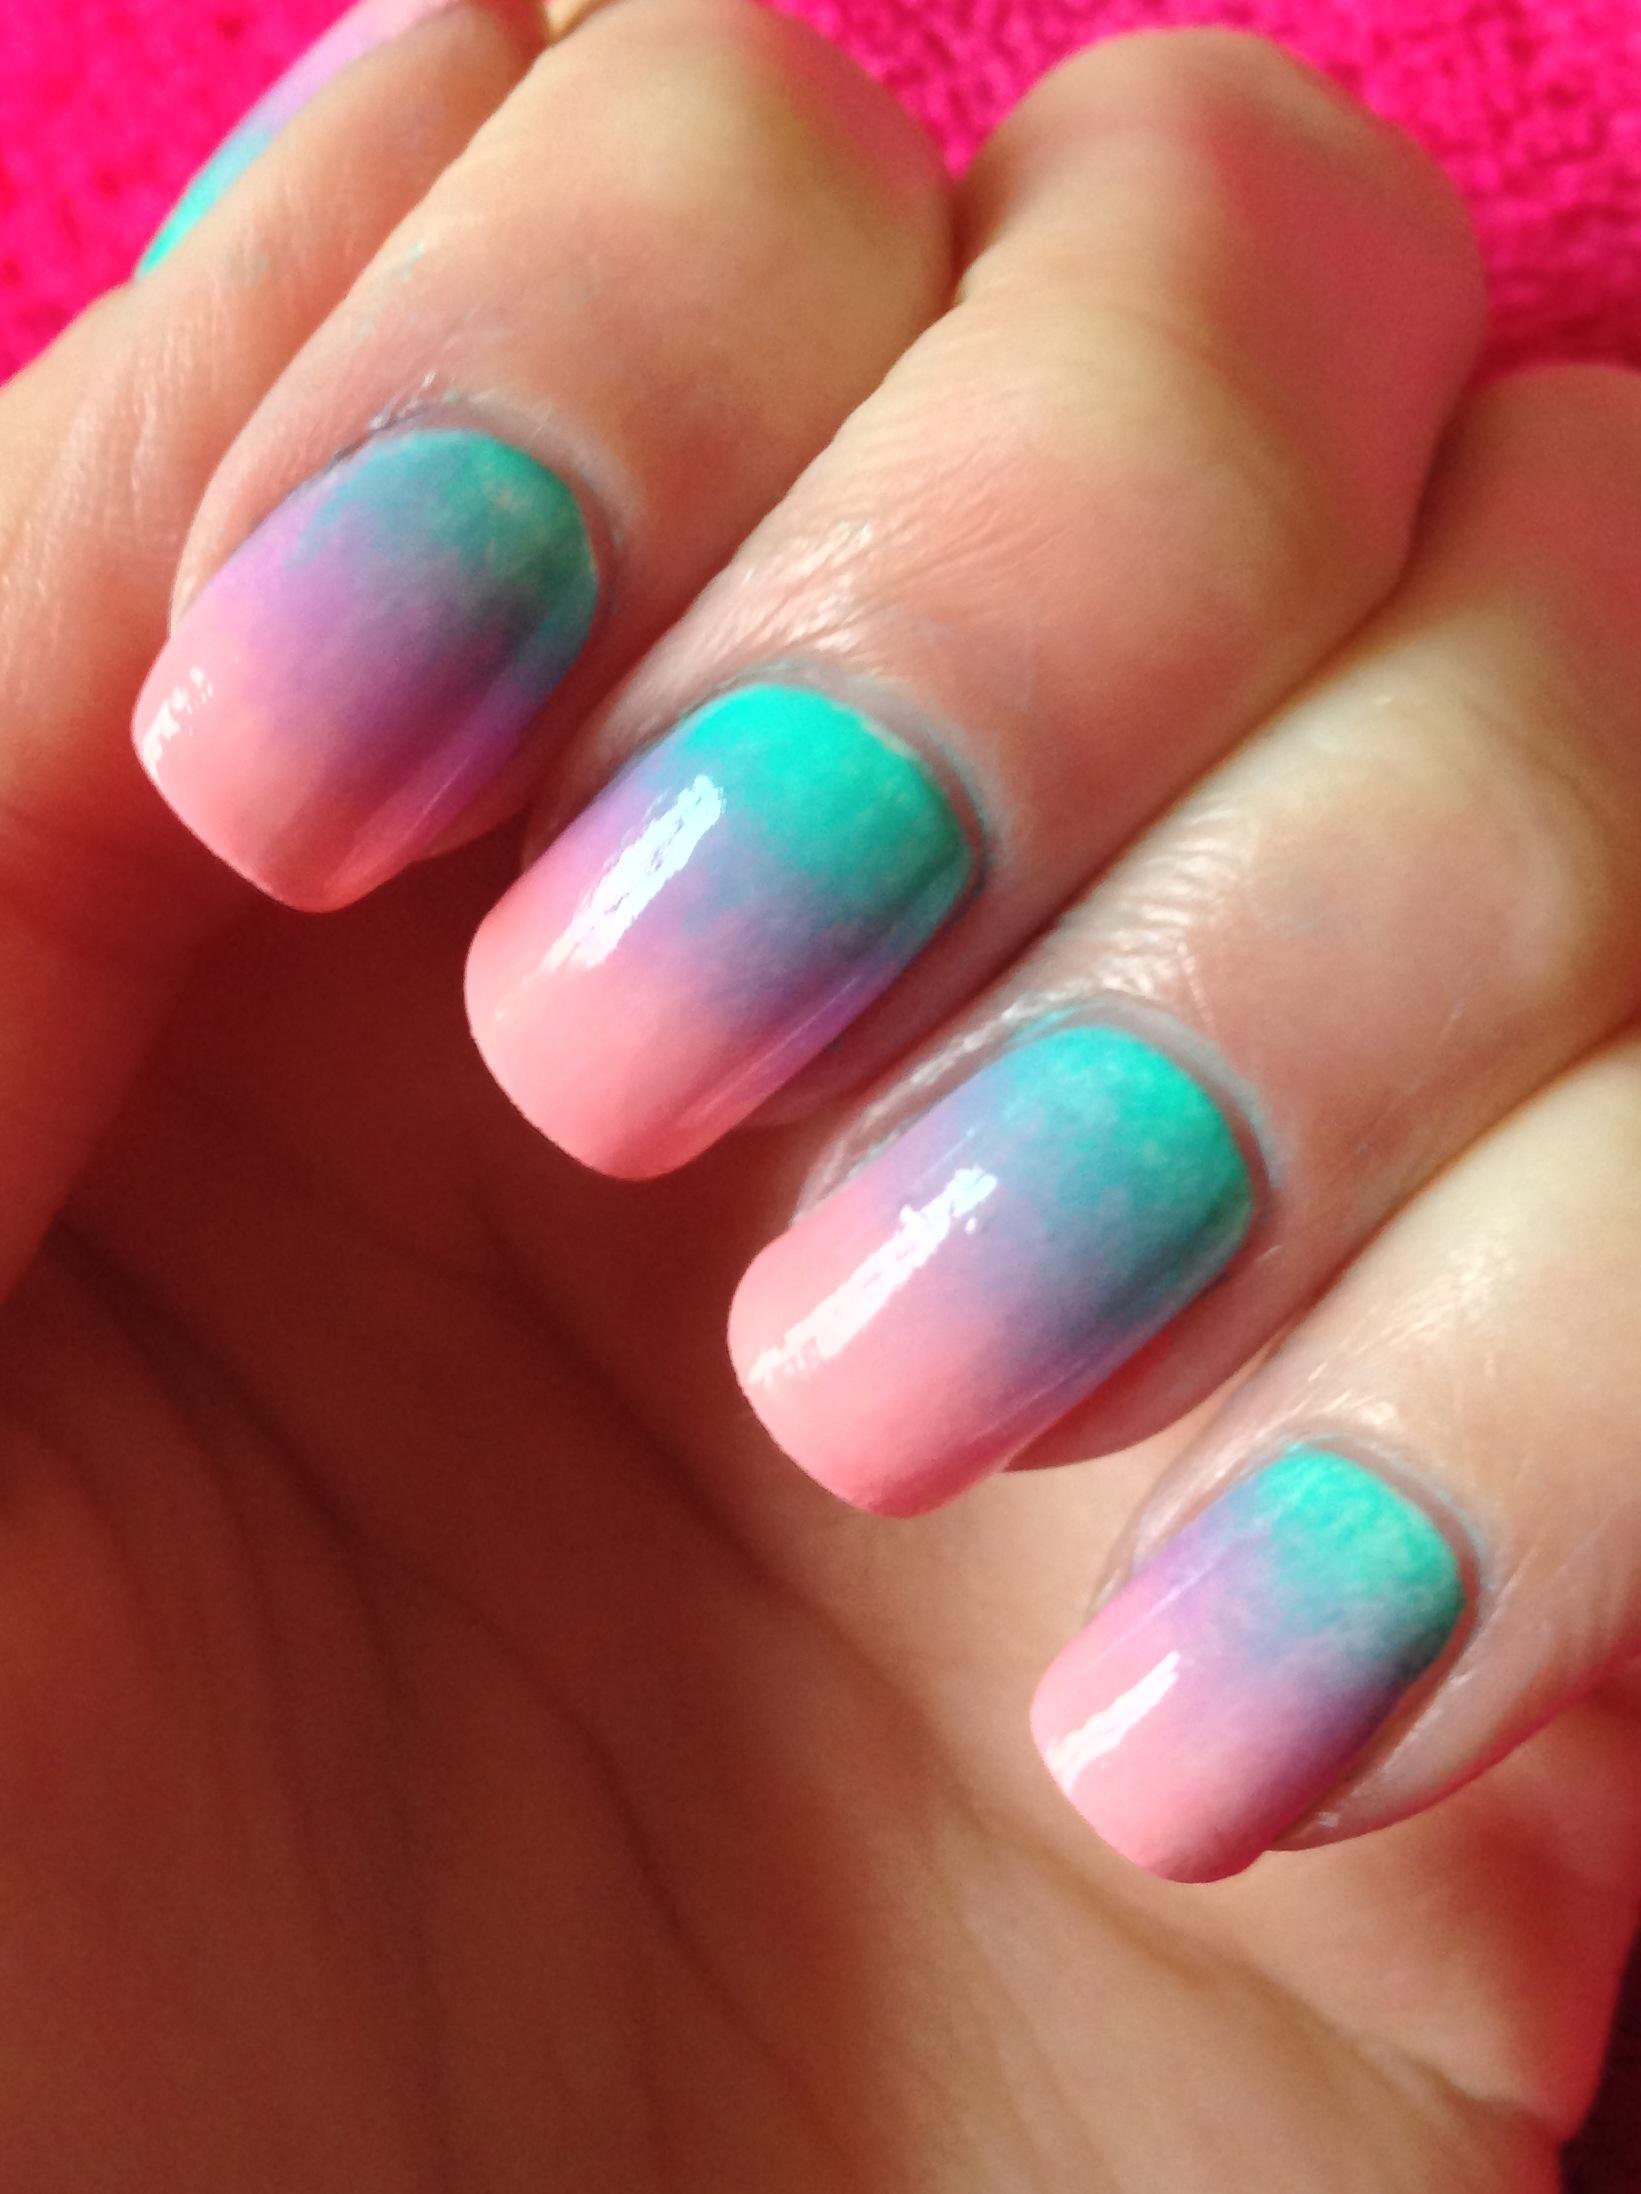 Gradient Nail Art | A Sparkling Finish